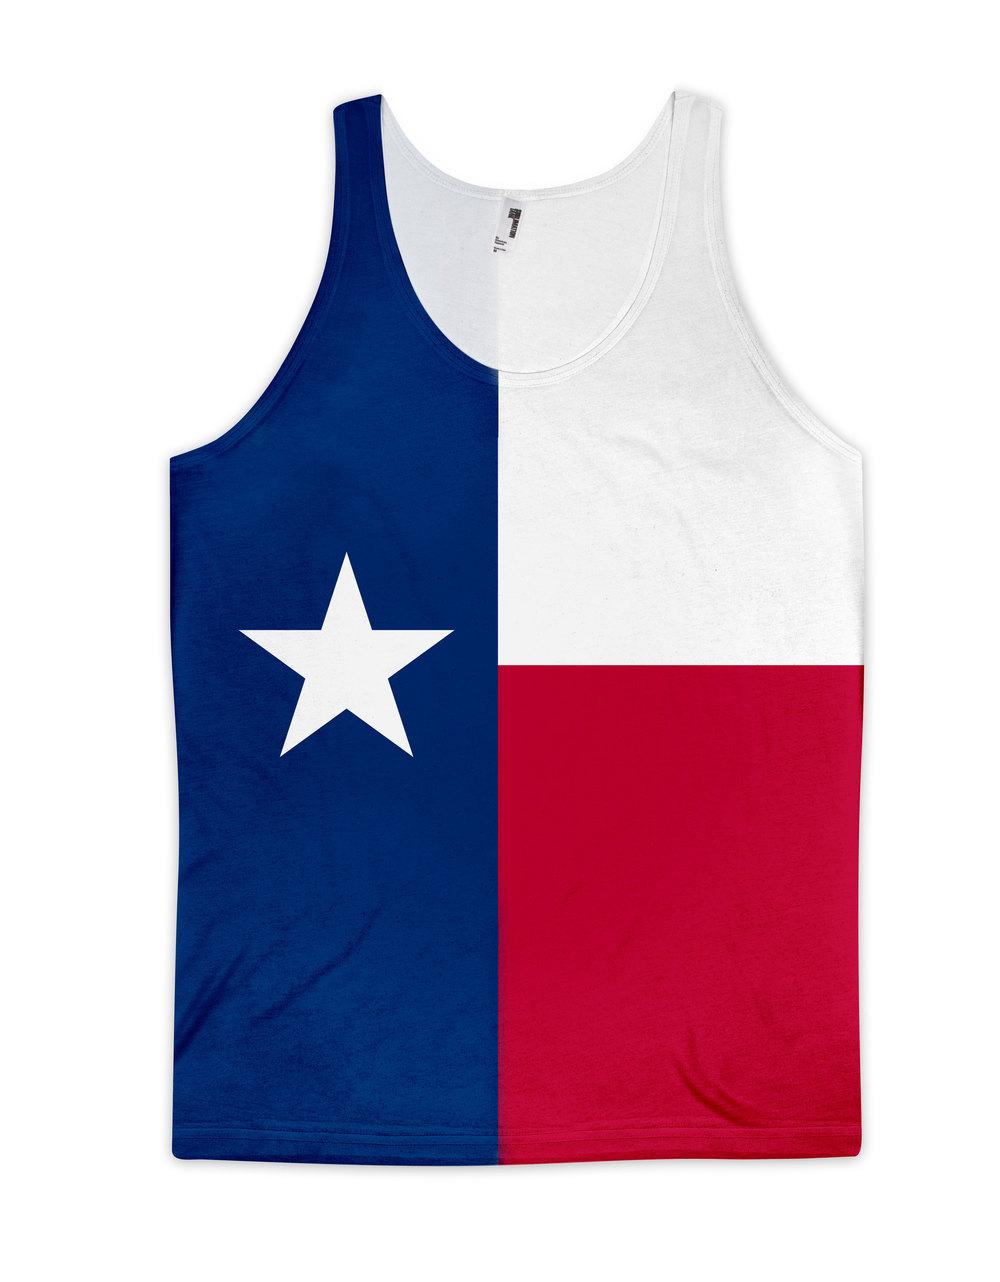 1000x1282 Texas Flag Tank Top (Unisex) All 50 Flags